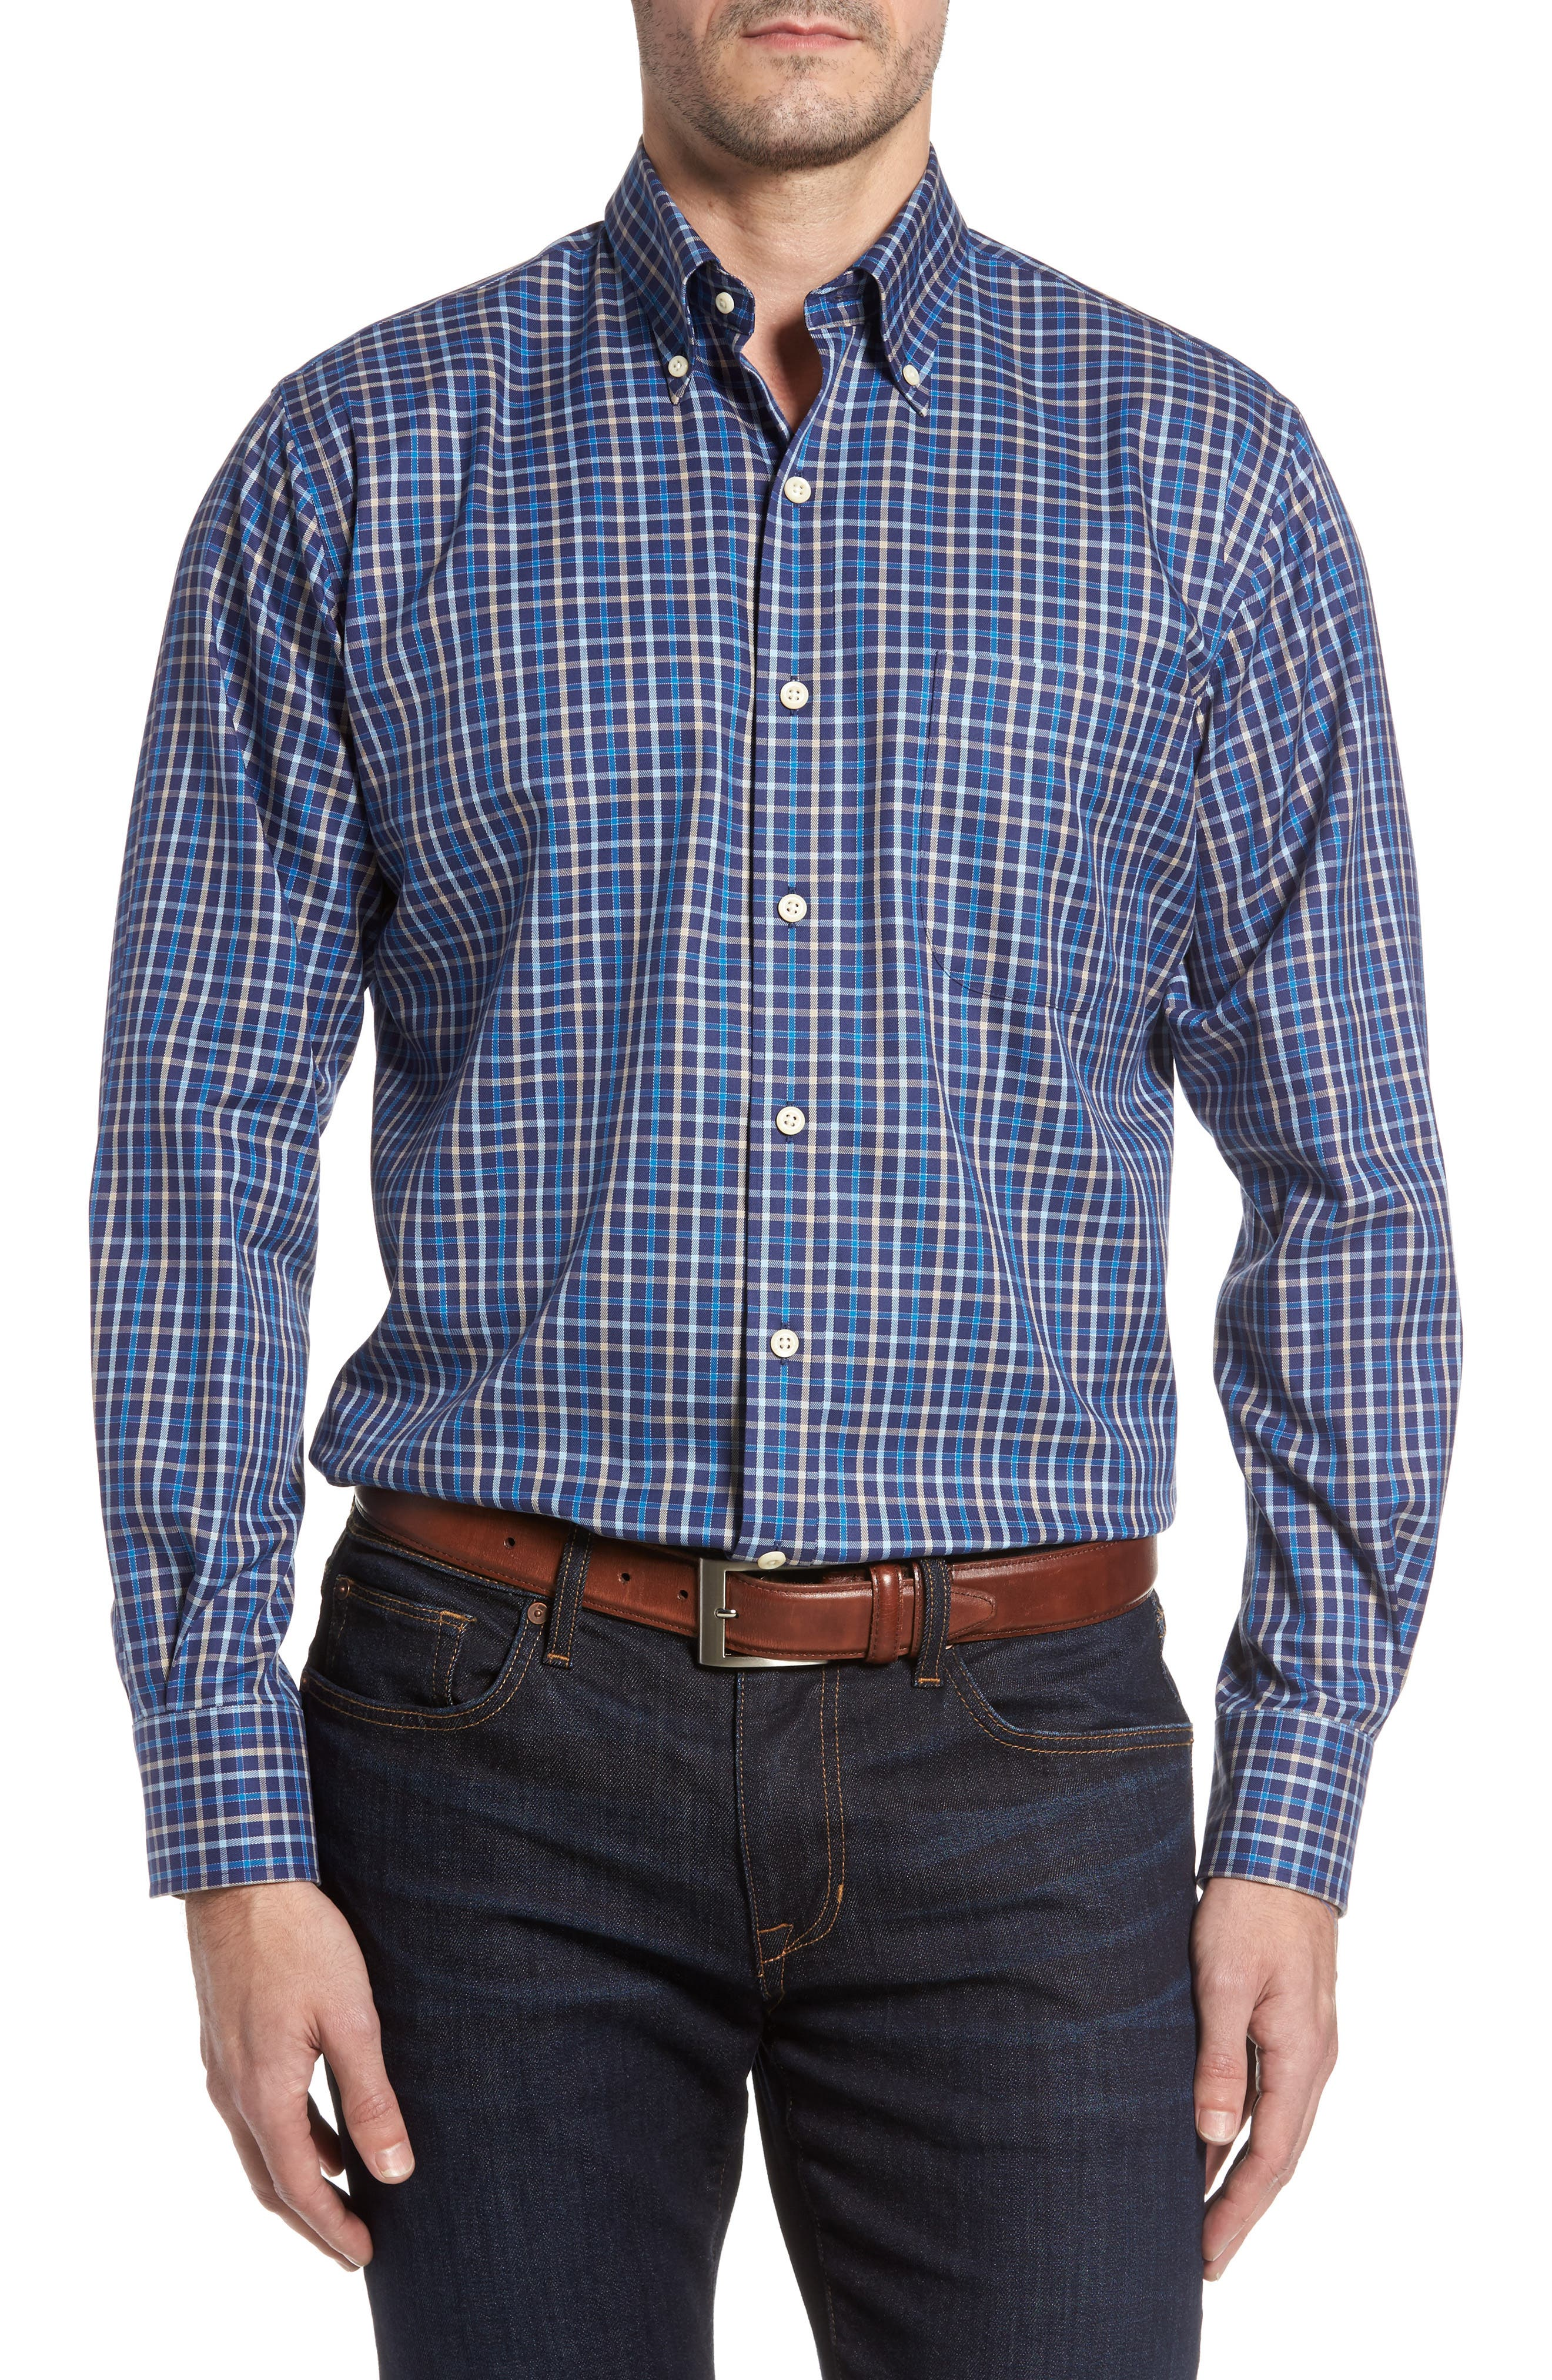 Main Image - Peter Millar Nanoluxe Pinwheel Regular Fit Check Sport Shirt